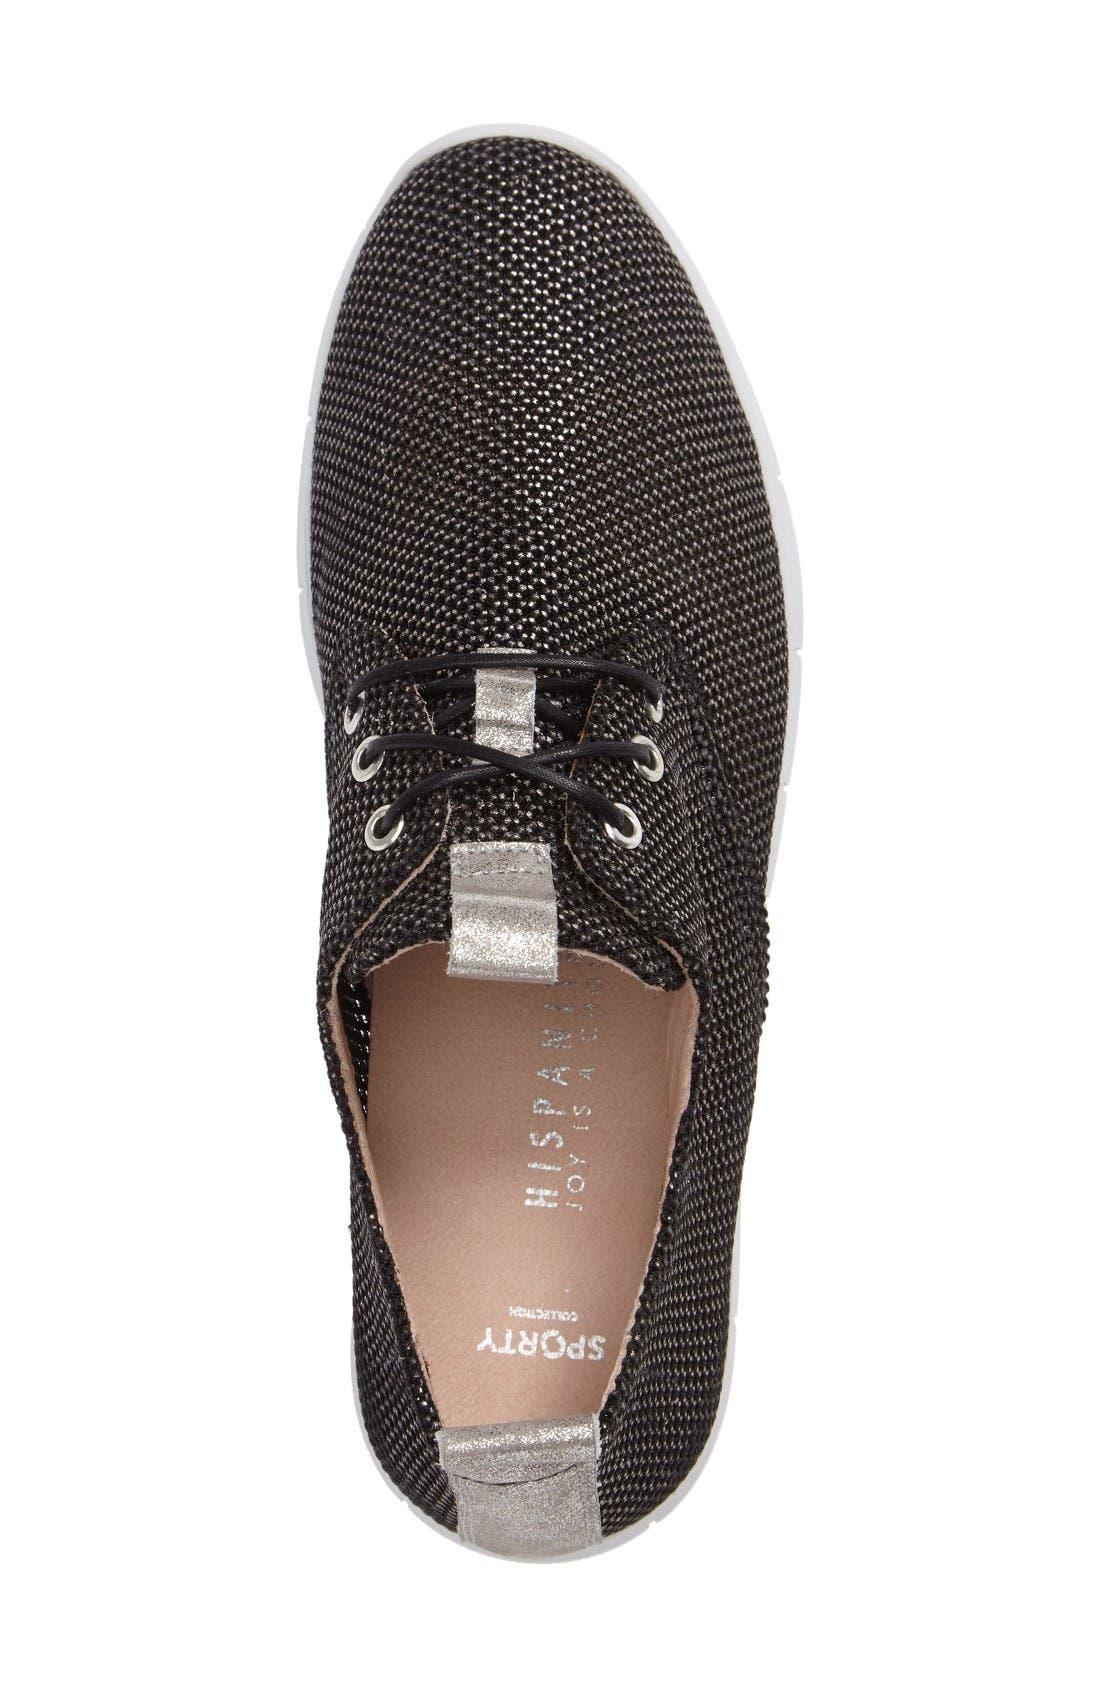 Alternate Image 3  - Hispanitas Gala Perforated Sneaker (Women)